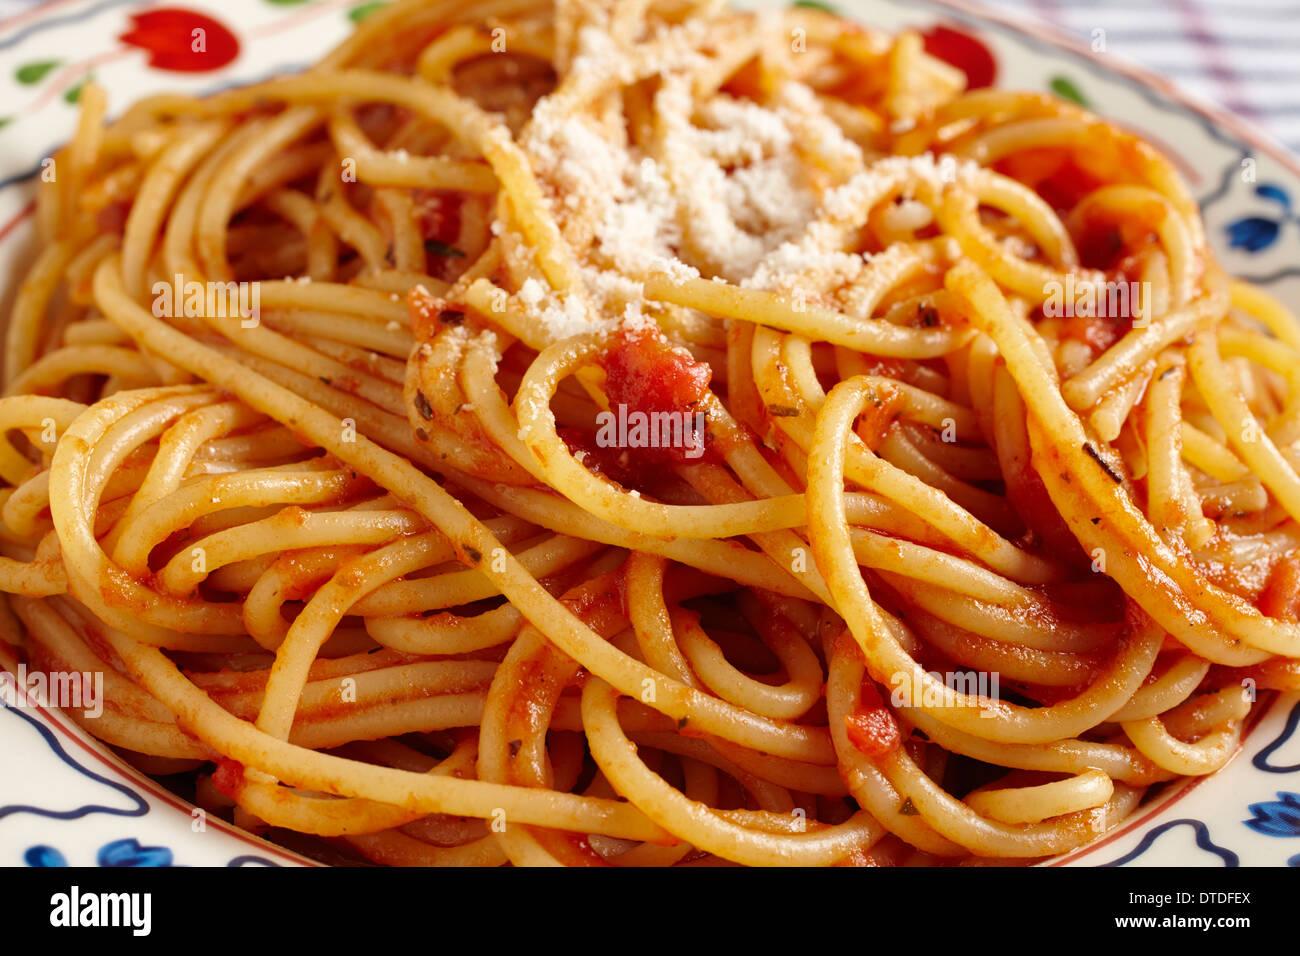 Spaghetti à la sauce tomate et fromage râpé Photo Stock